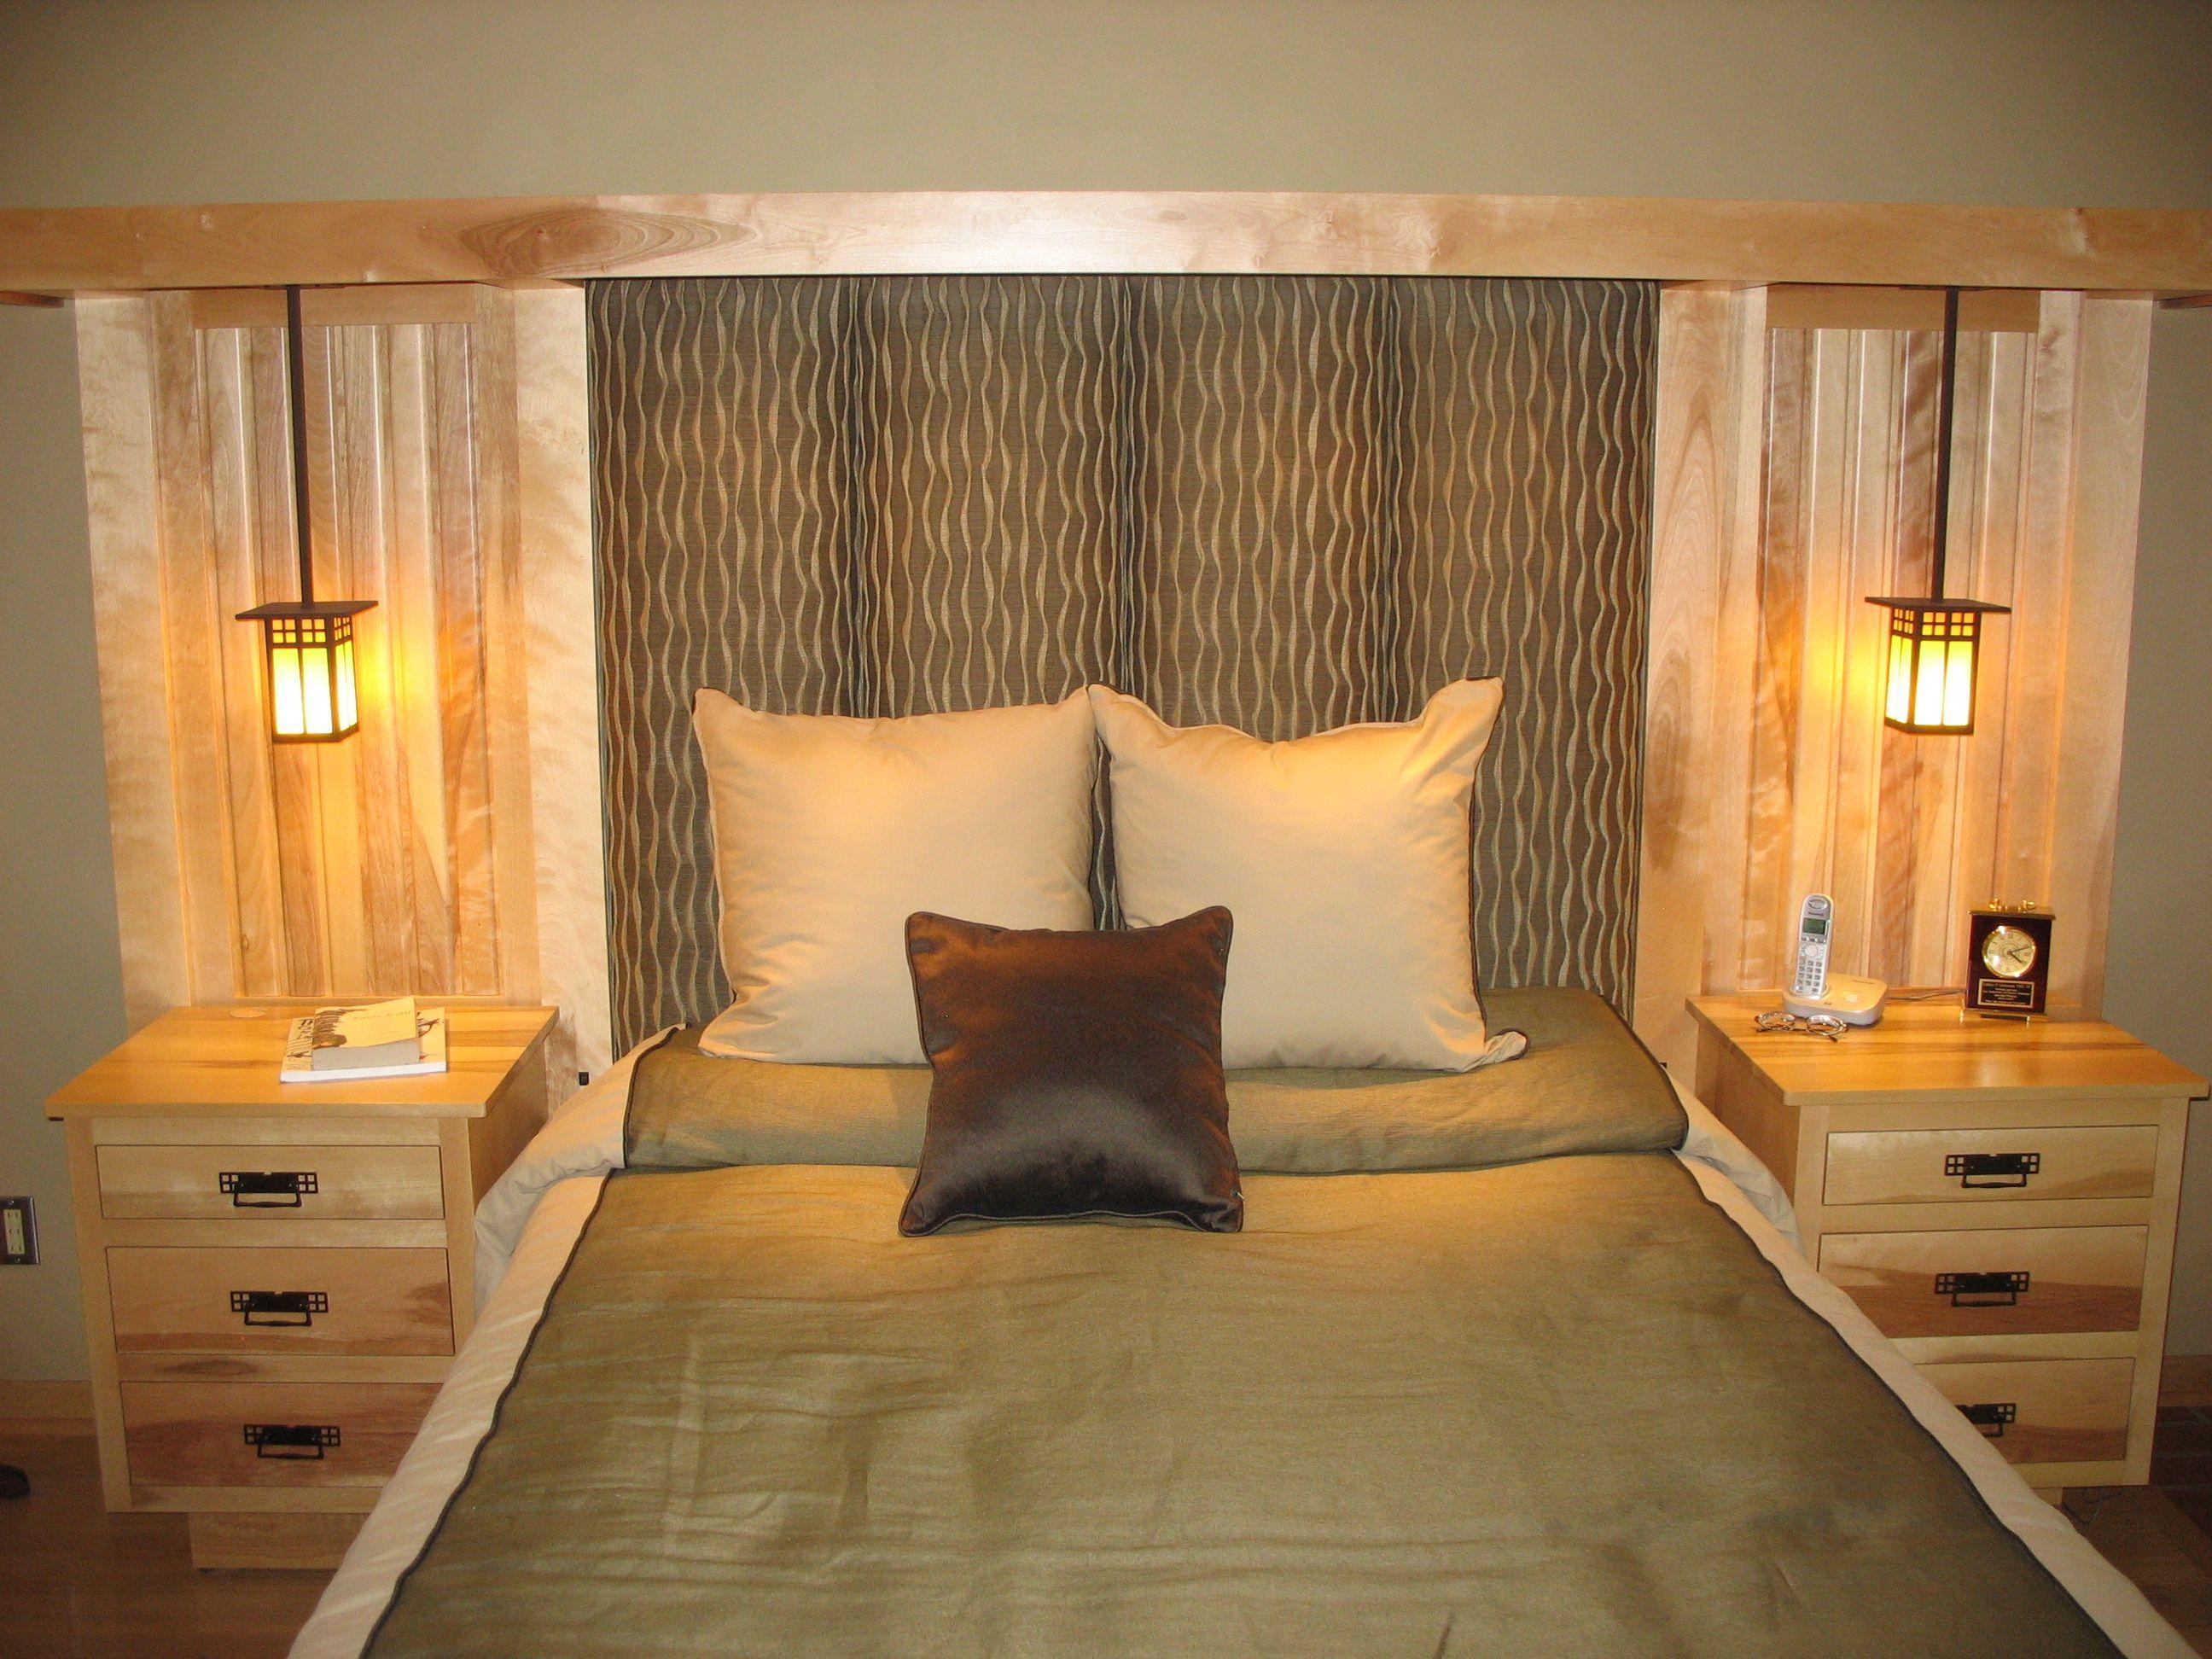 Custom Built Bedroom Furniture Best Bedroom Furniture Check more